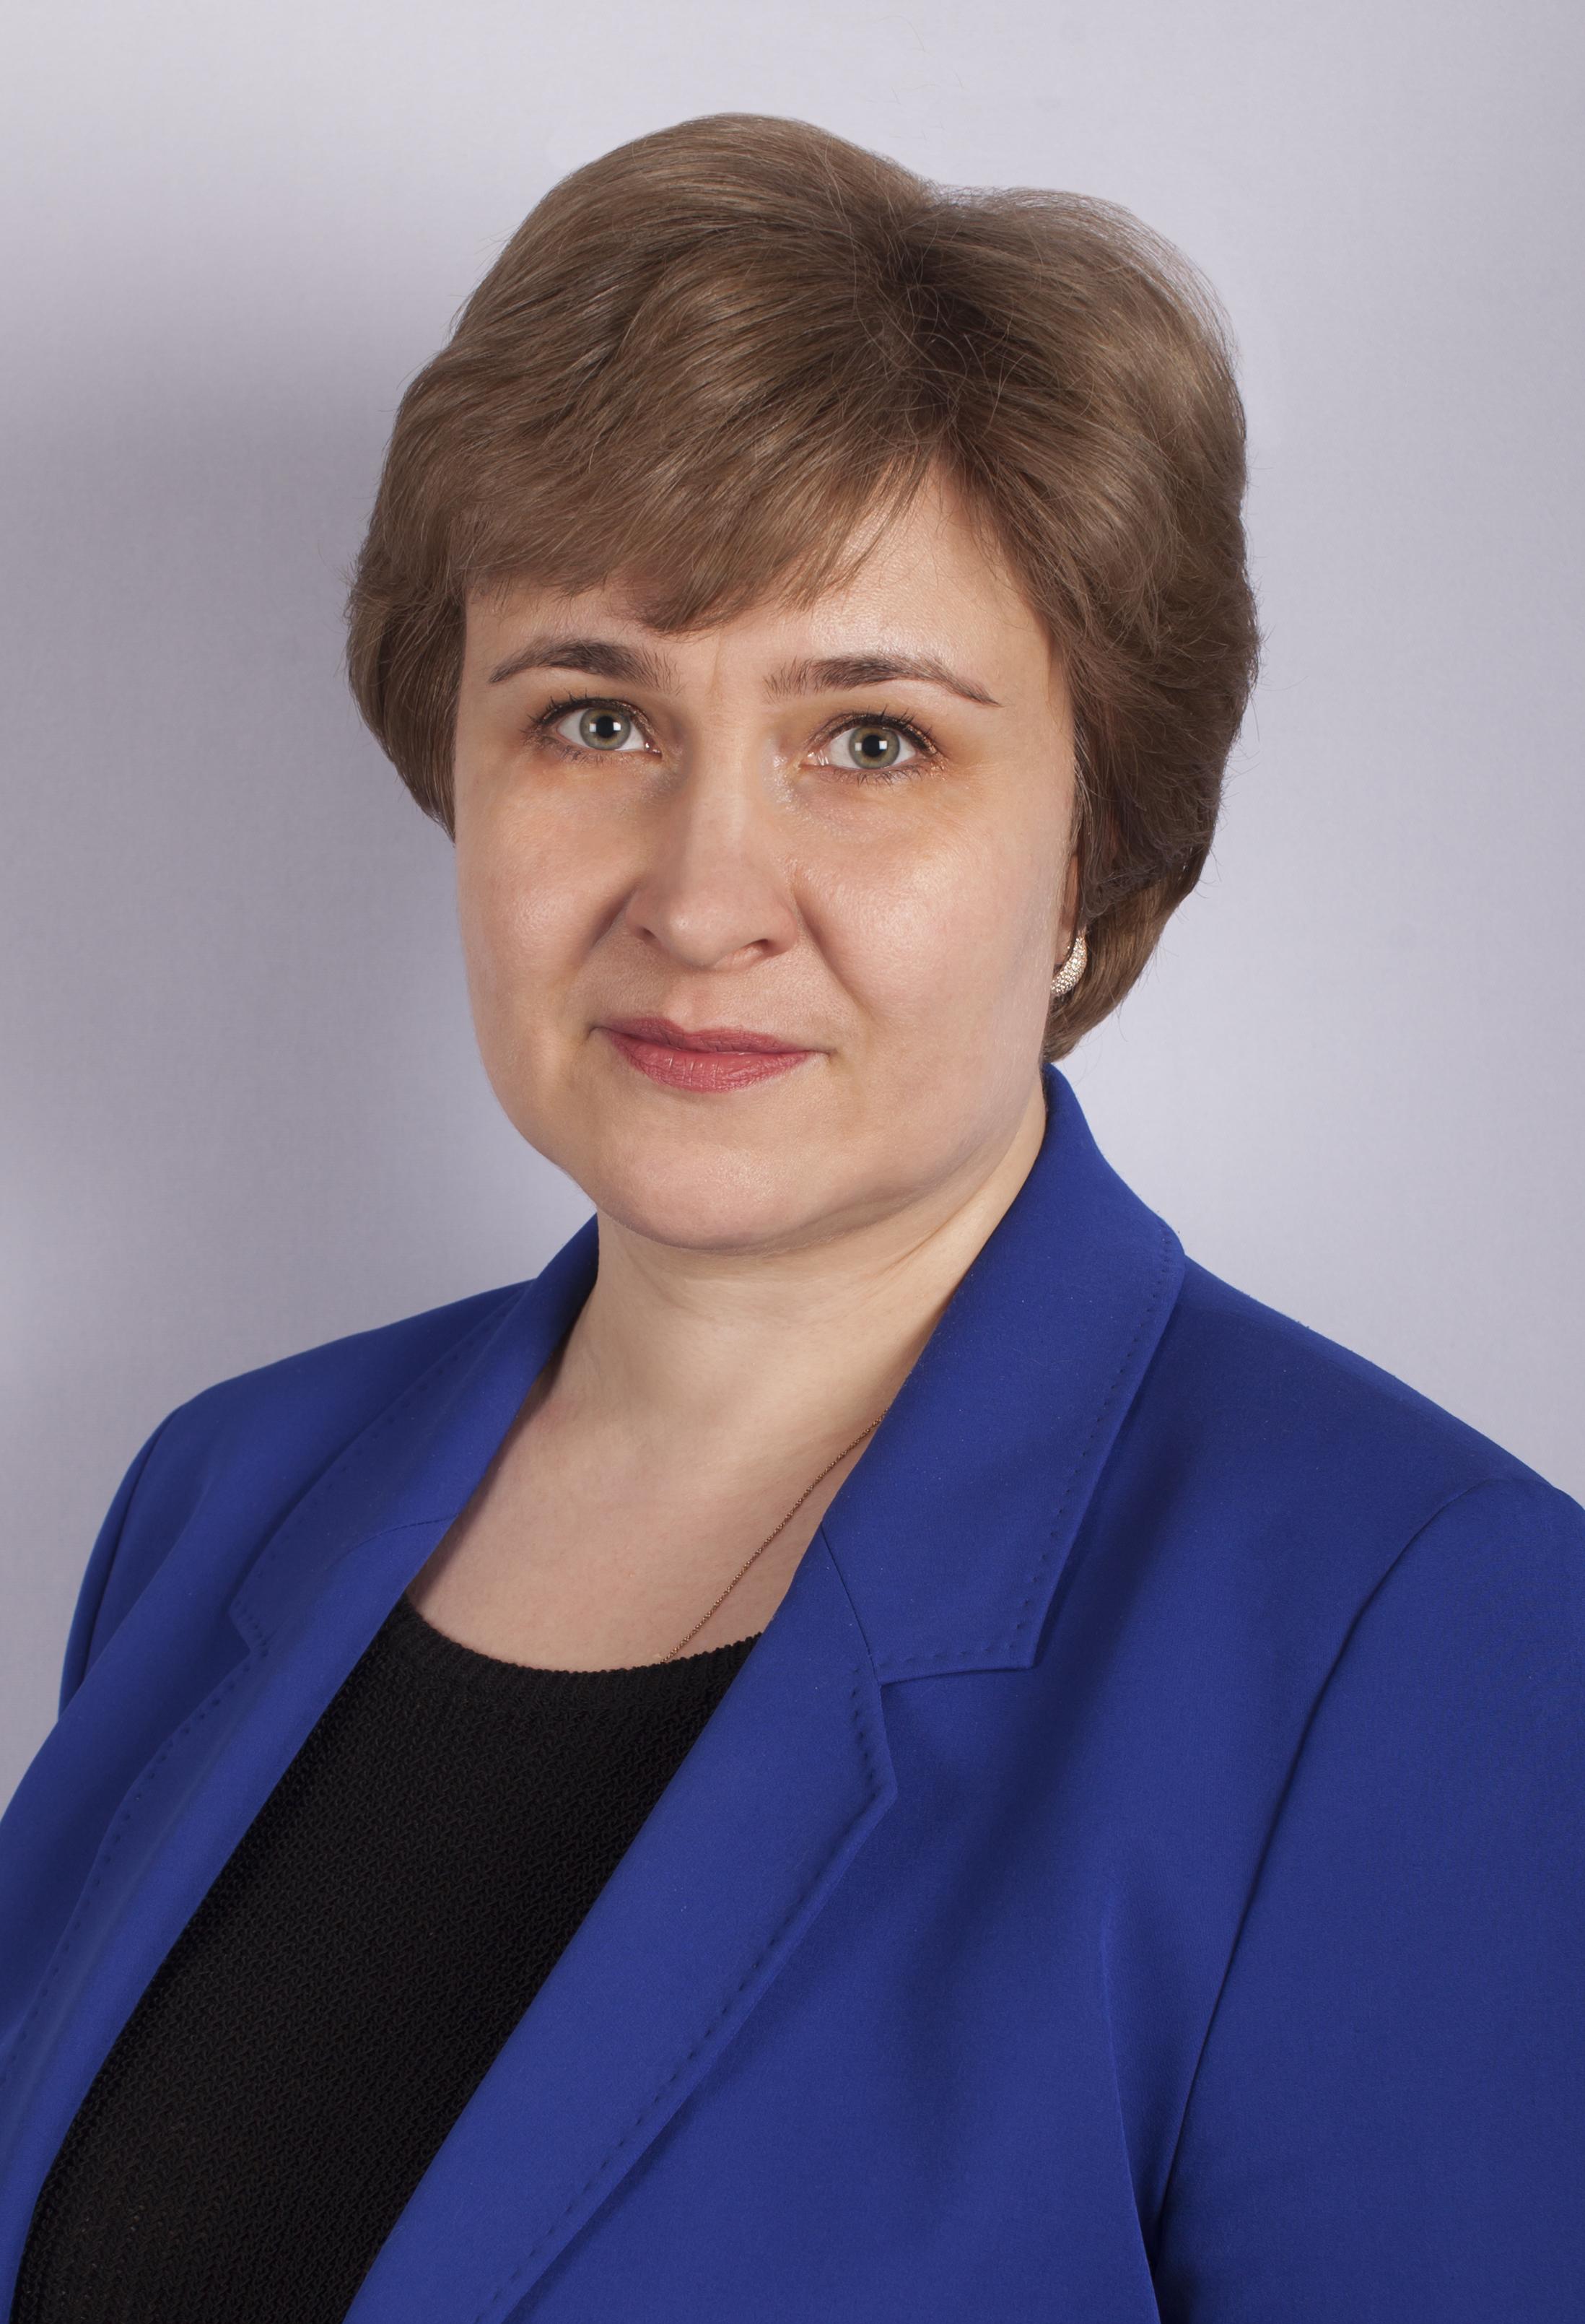 Андреенко Татьяна Анатольевна